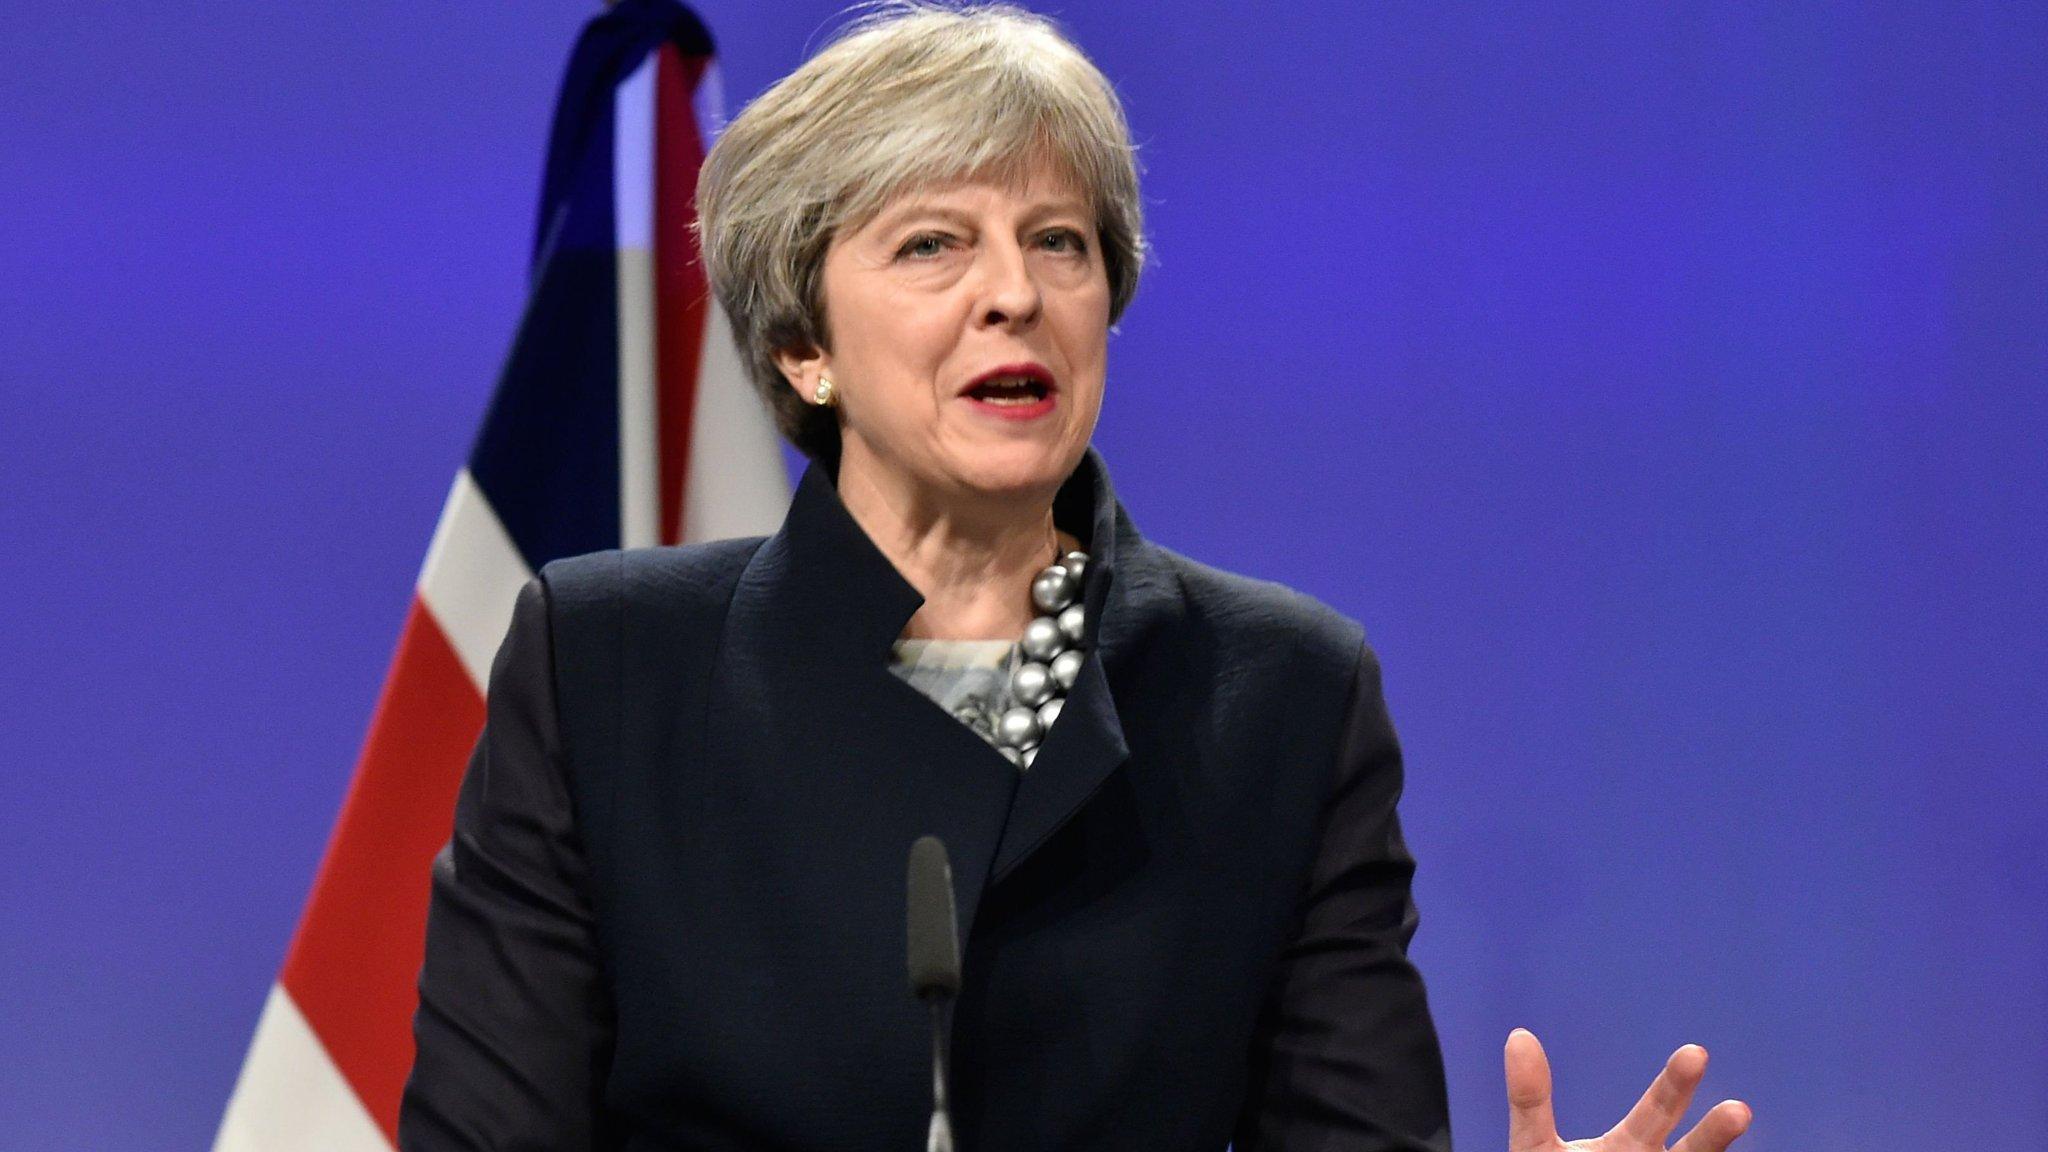 Pound falls sharply on breakdown in Brexit talks